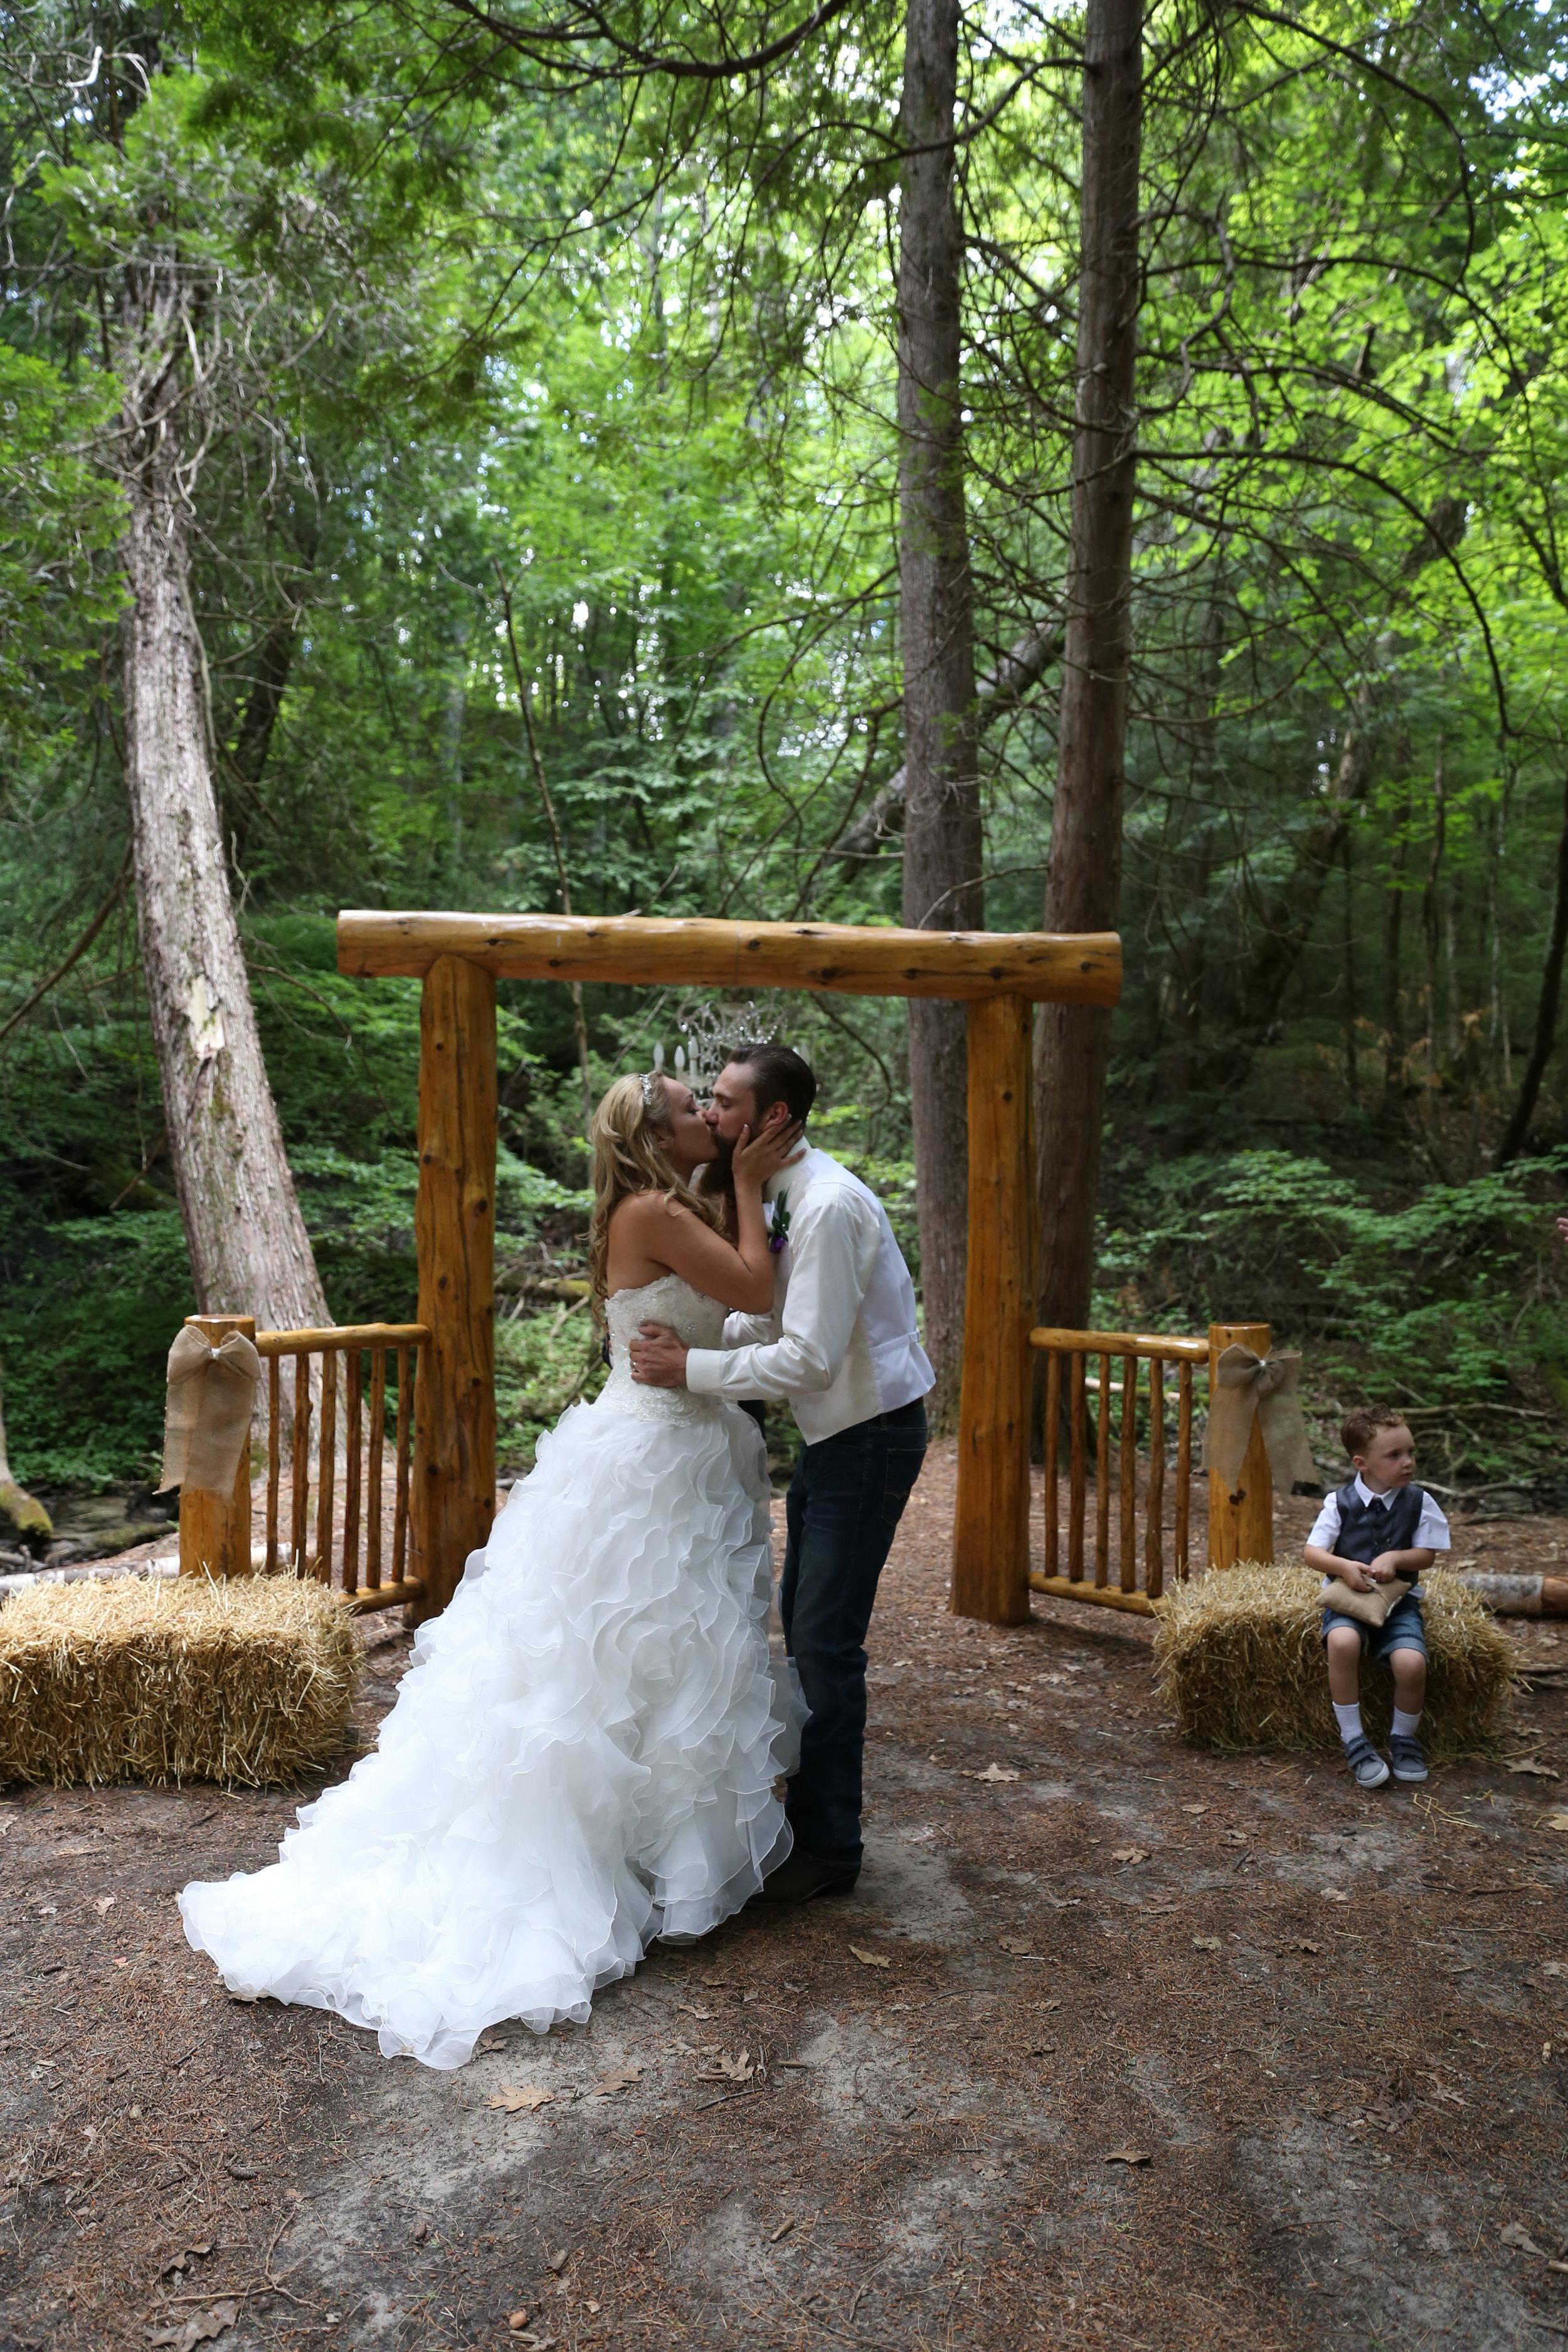 ganaraska wedding 44.JPG